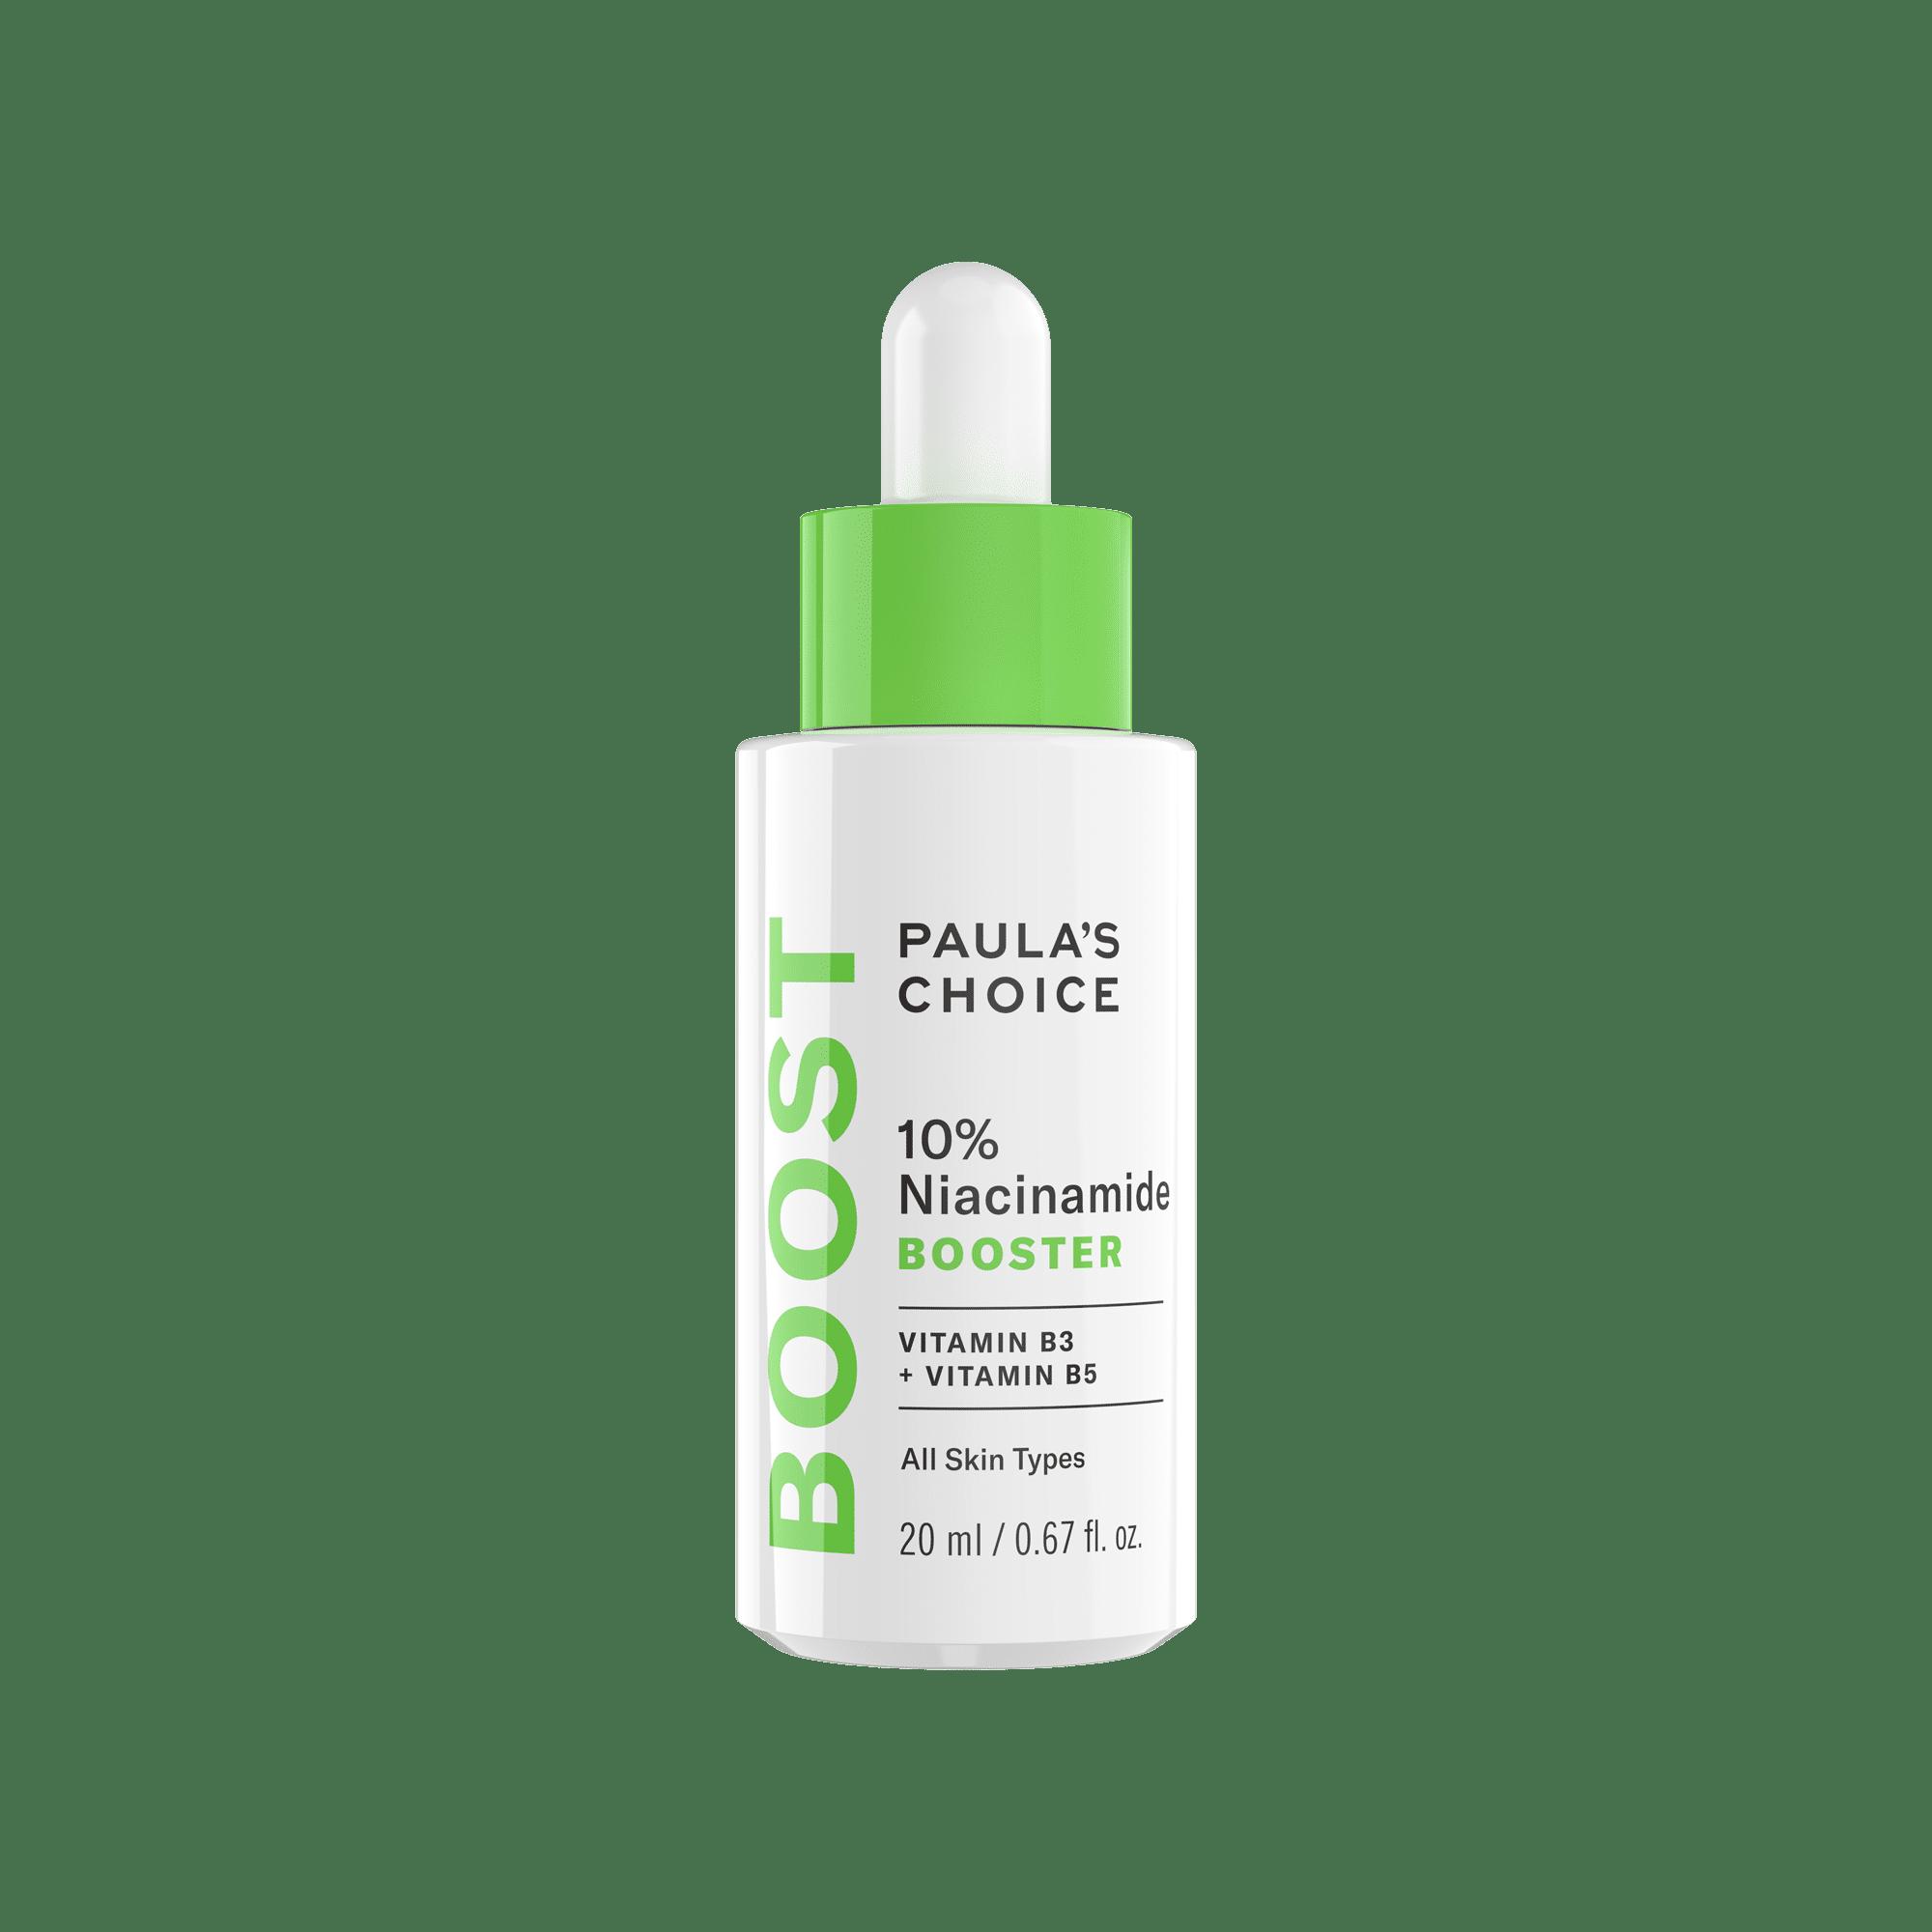 Paula's Choice - 10% Niacinamide Booster